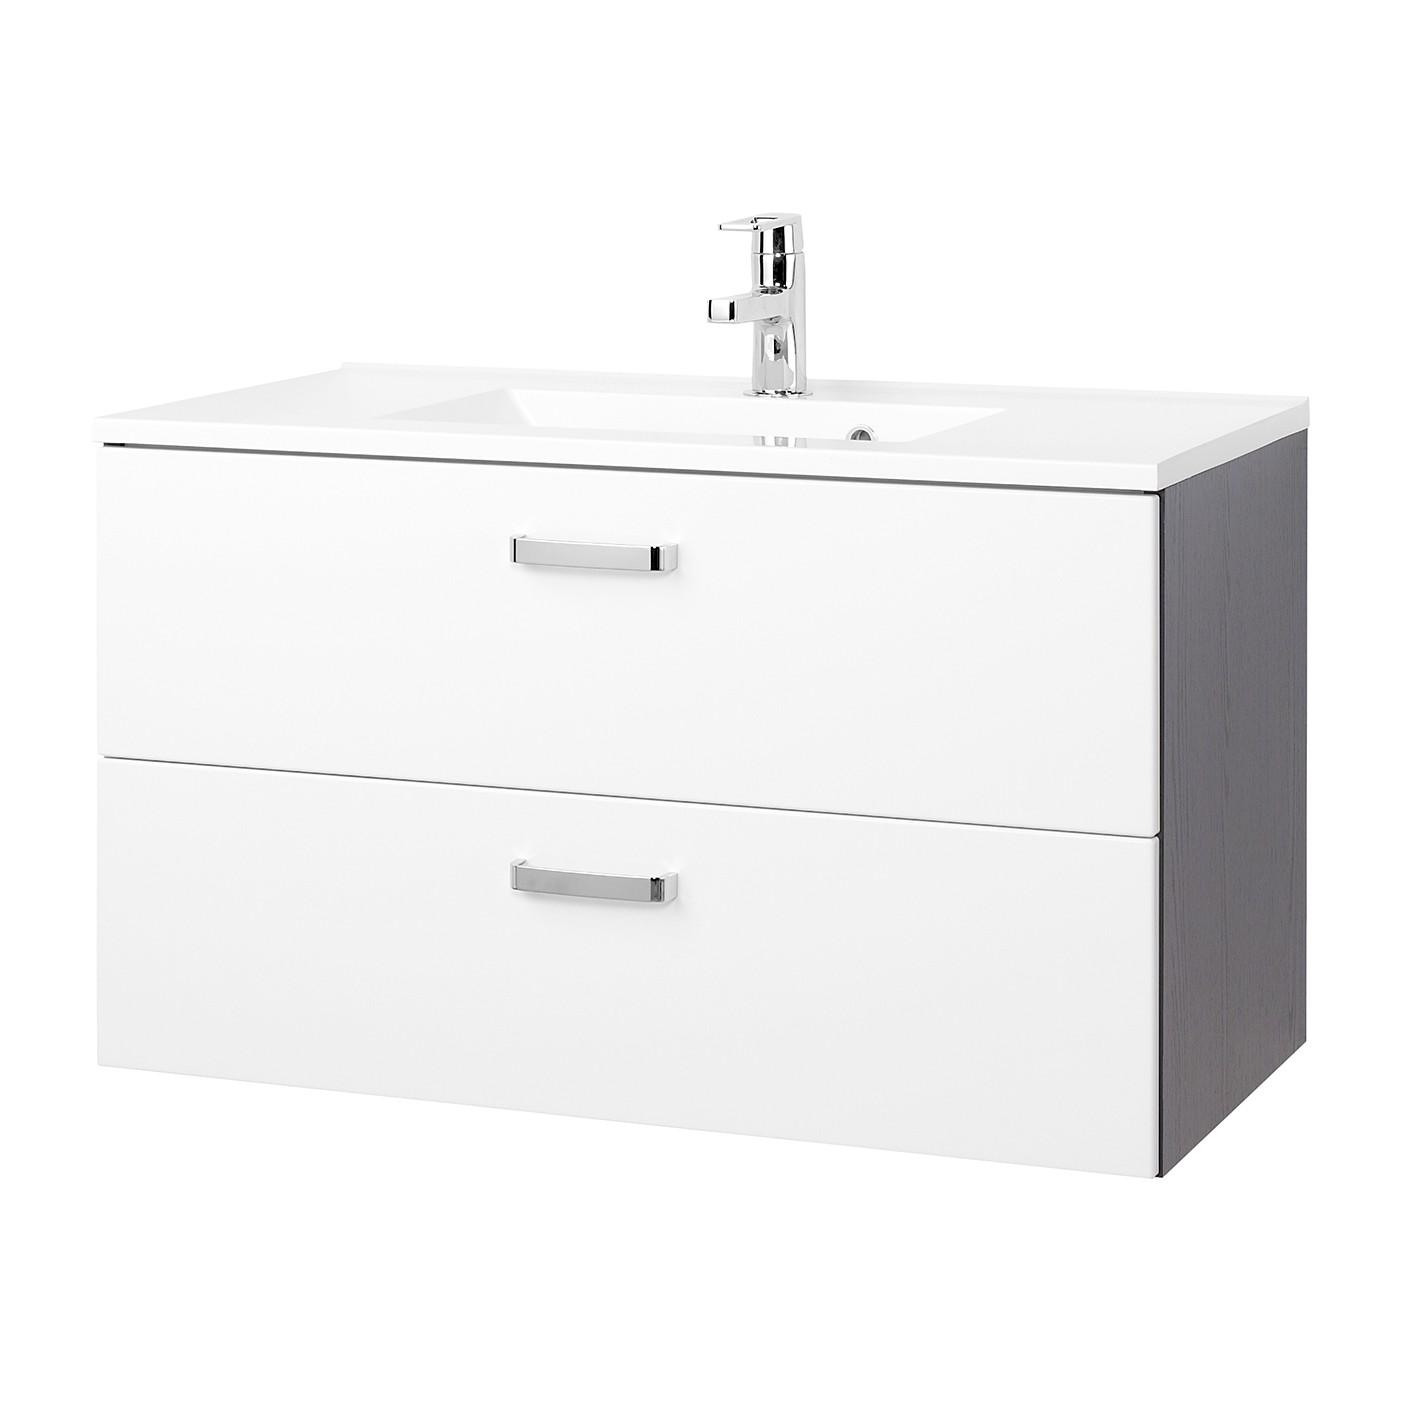 Mobile lavabo Zeehan - Bianco / Grigio - 90 cm, Giessbach